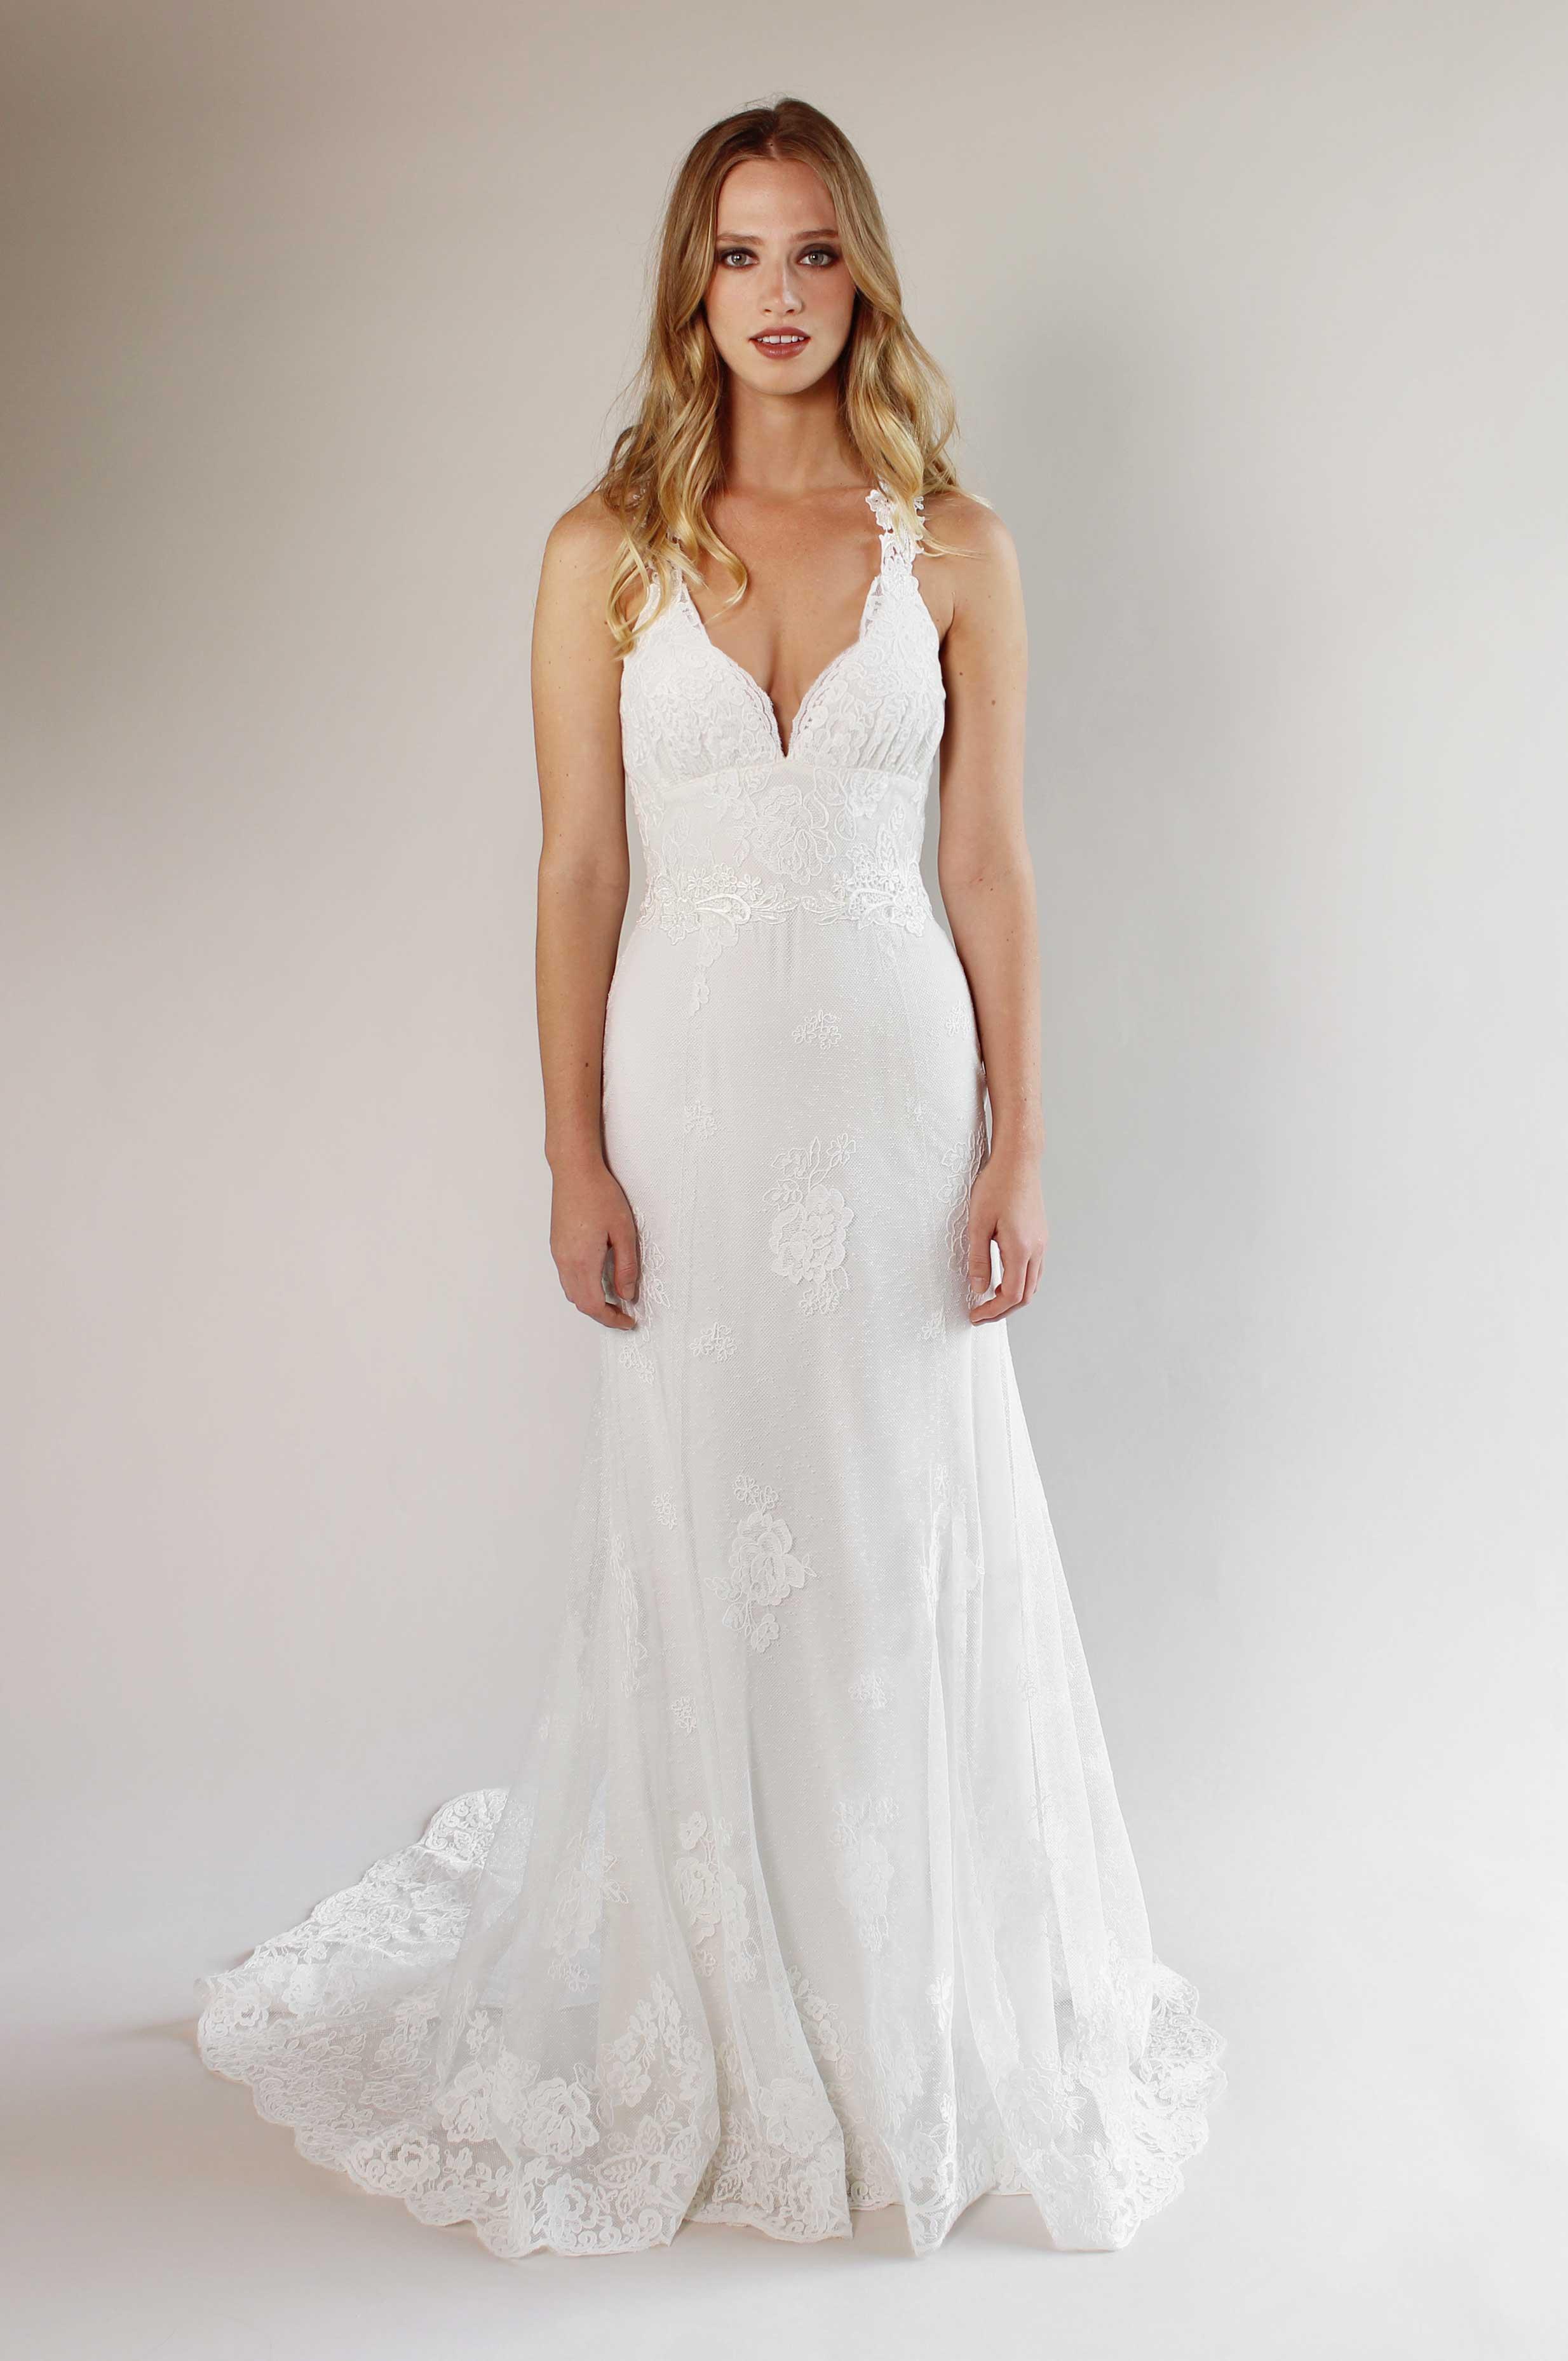 Claire Pettibone wedding dress, tina fey emmys inspiration